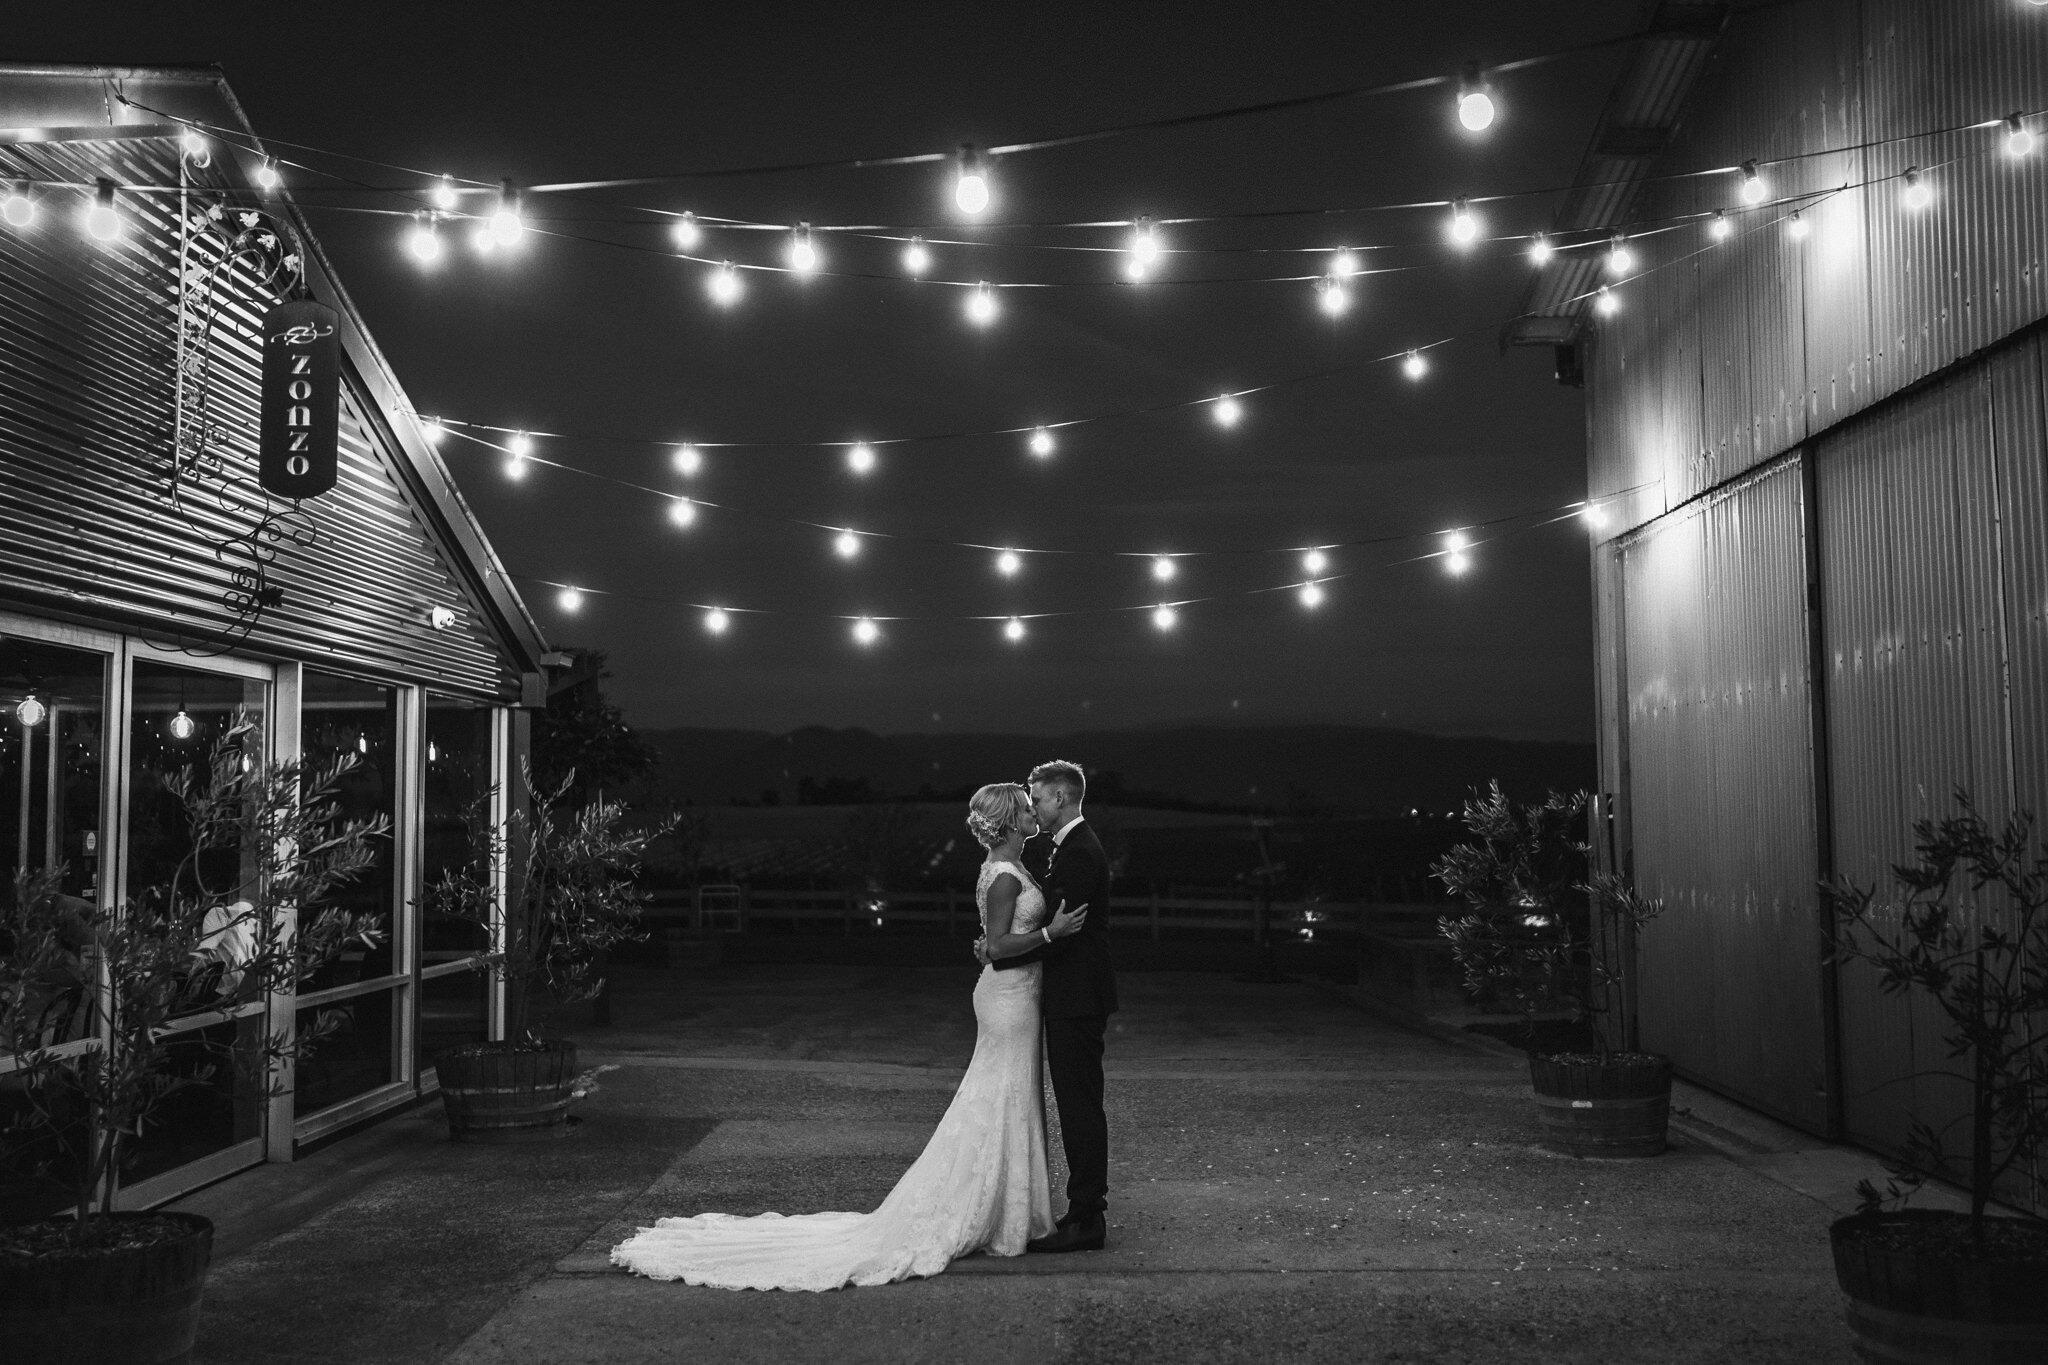 Corey Wright Zonzo Yarra Valley Wedding Photography_004